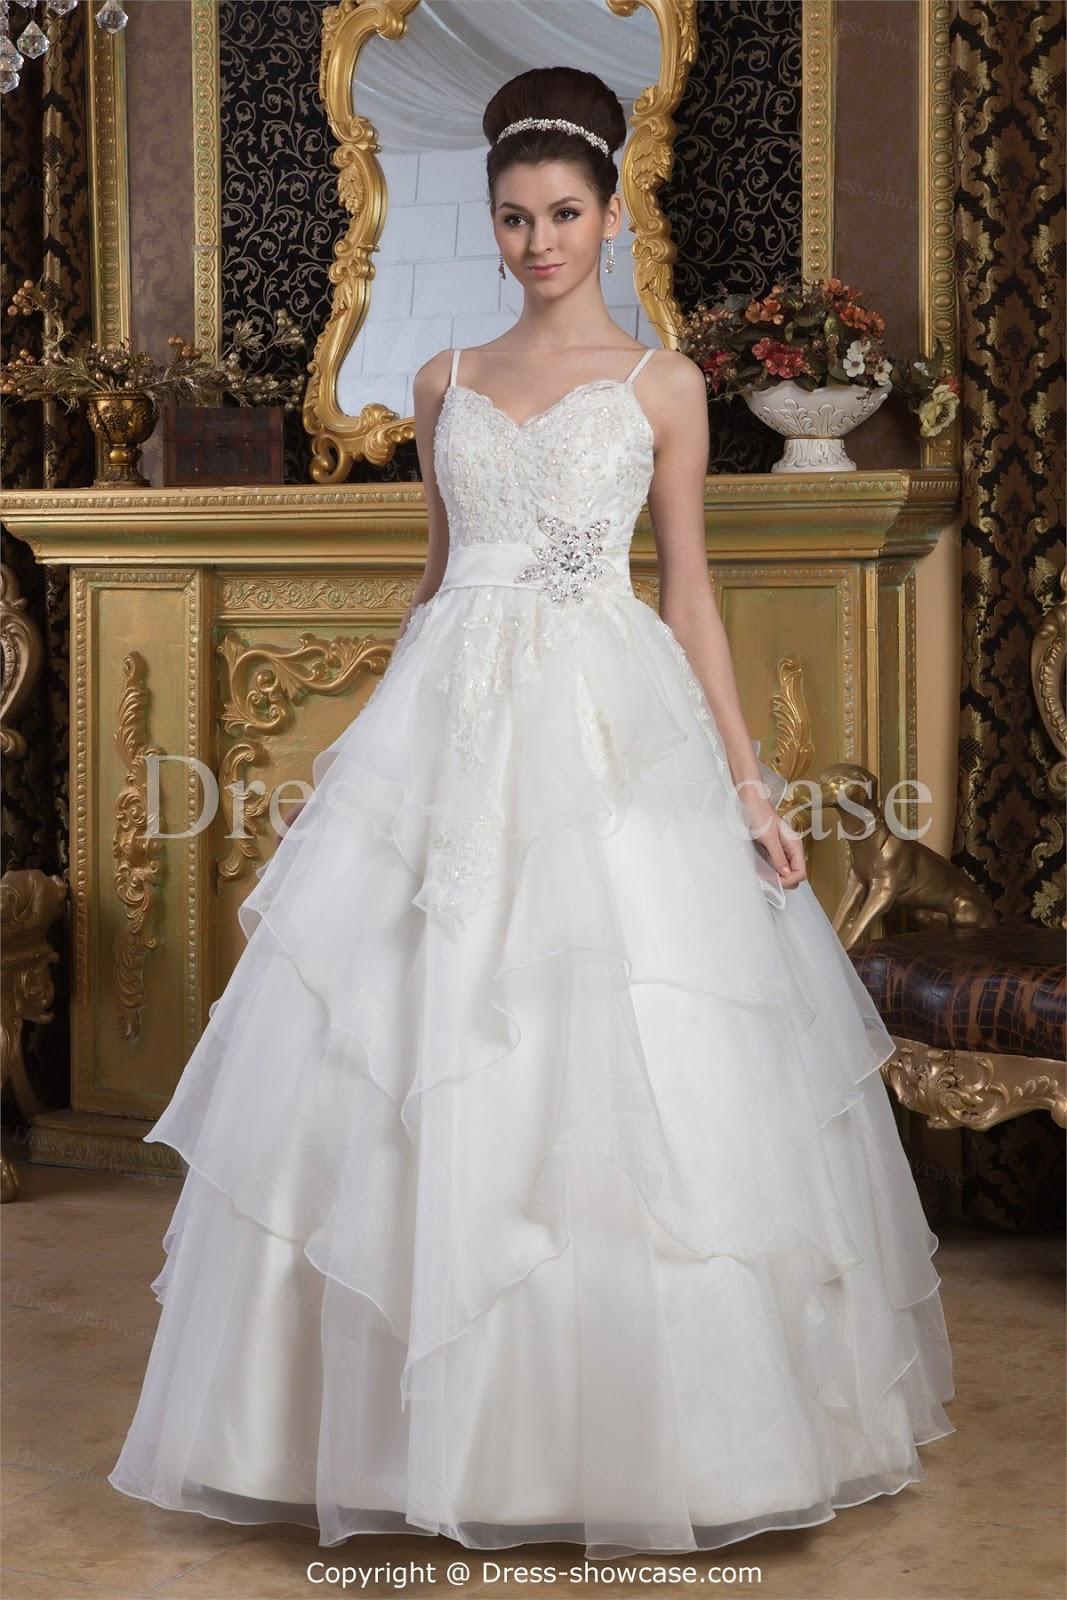 wedding dresses for petite women photo - 1